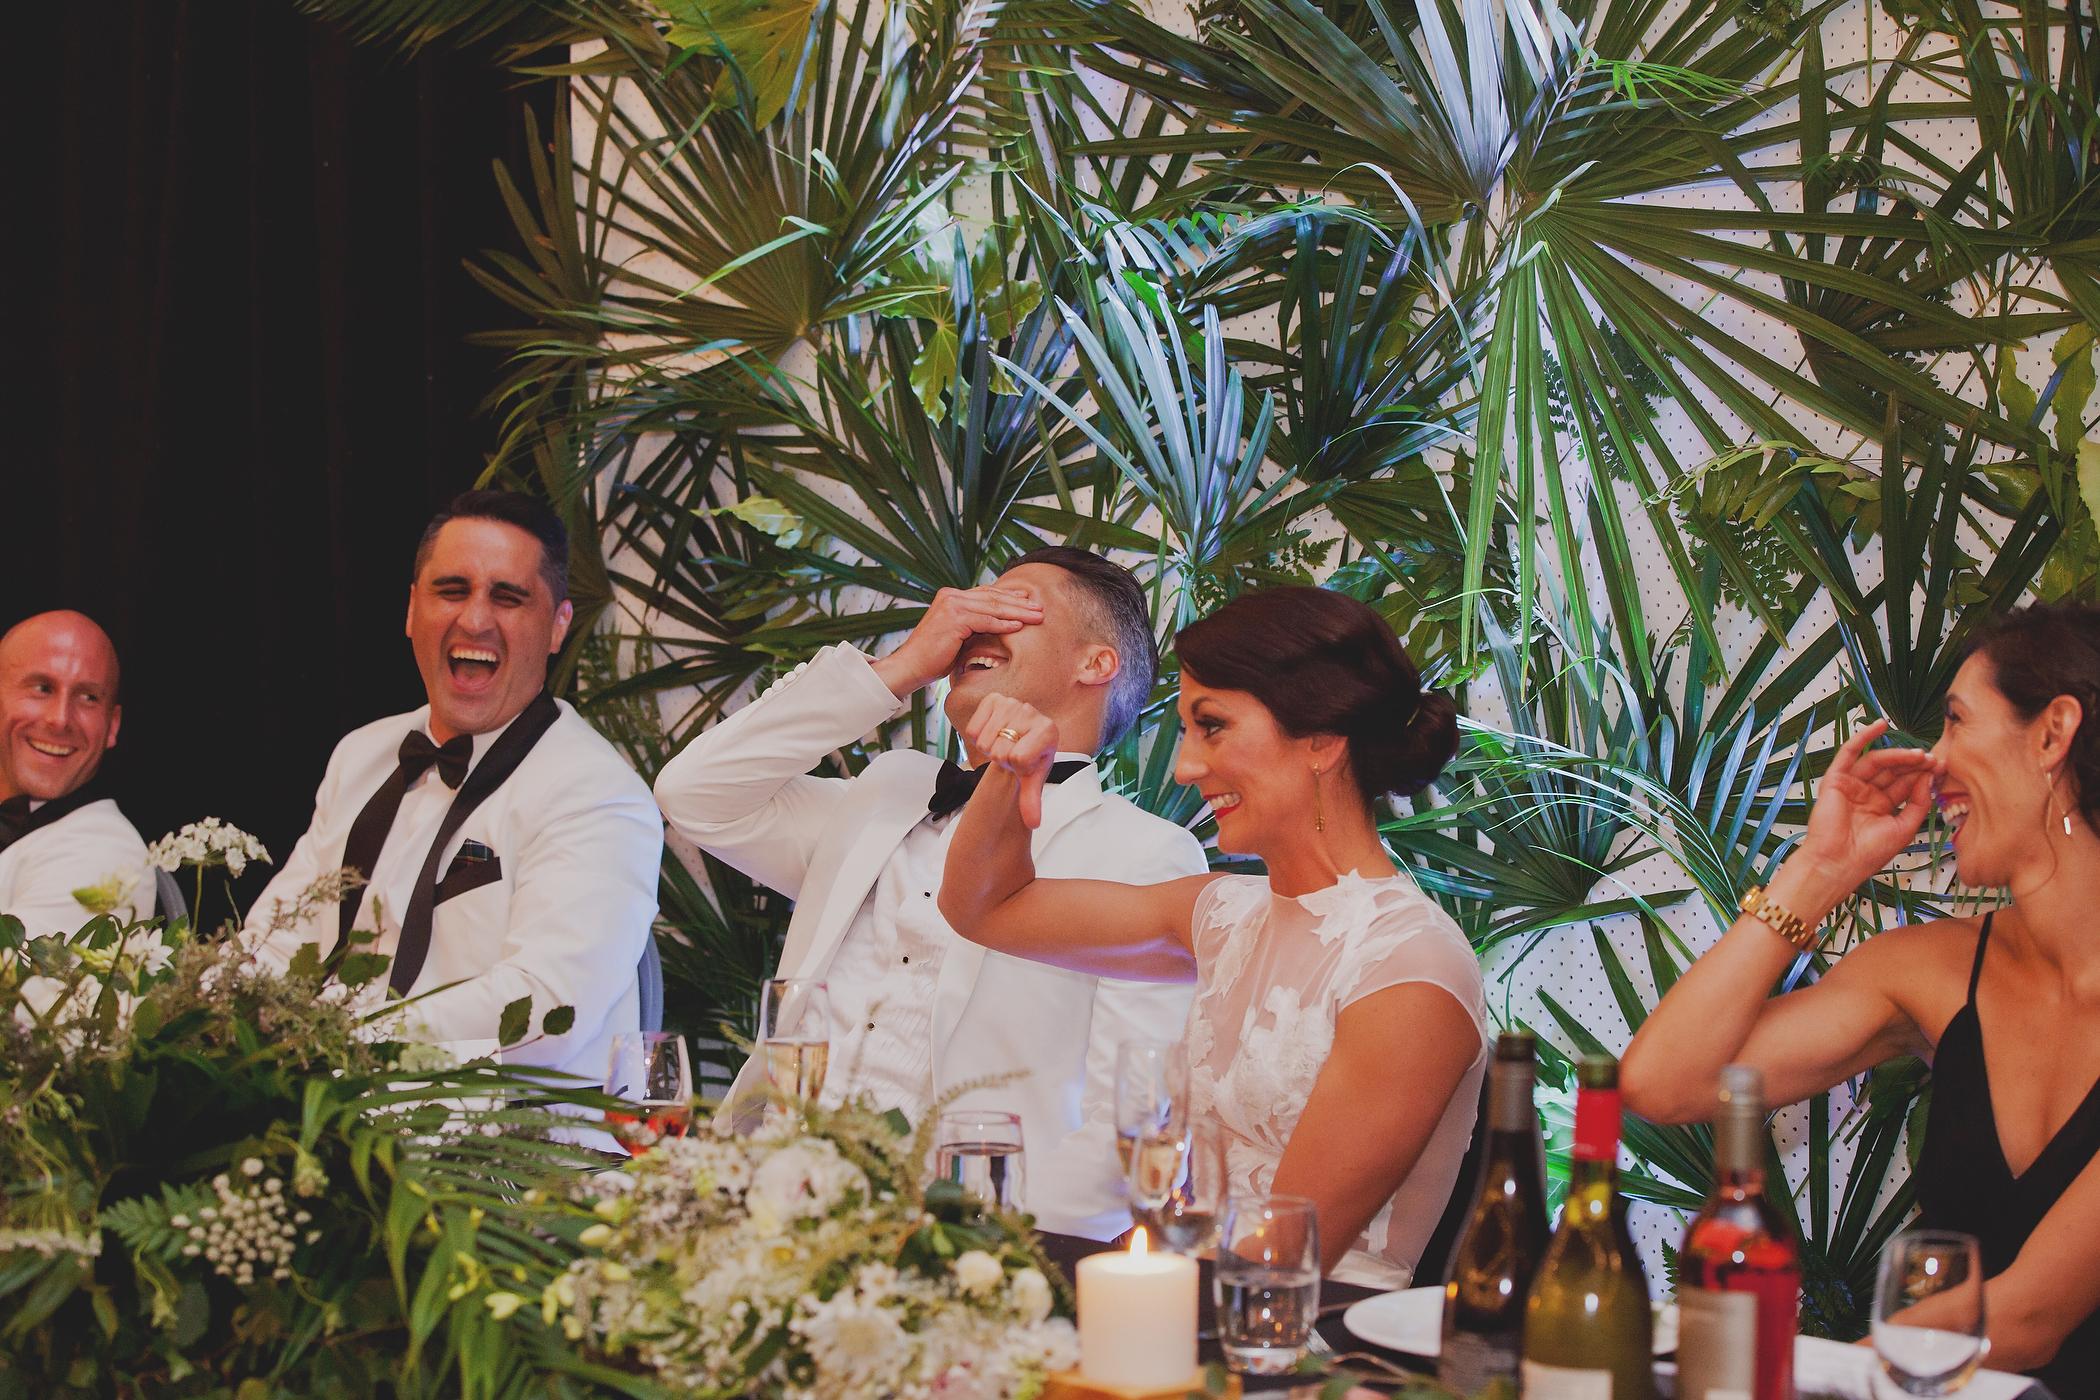 wellington wedding photography NZ - 1301.JPG